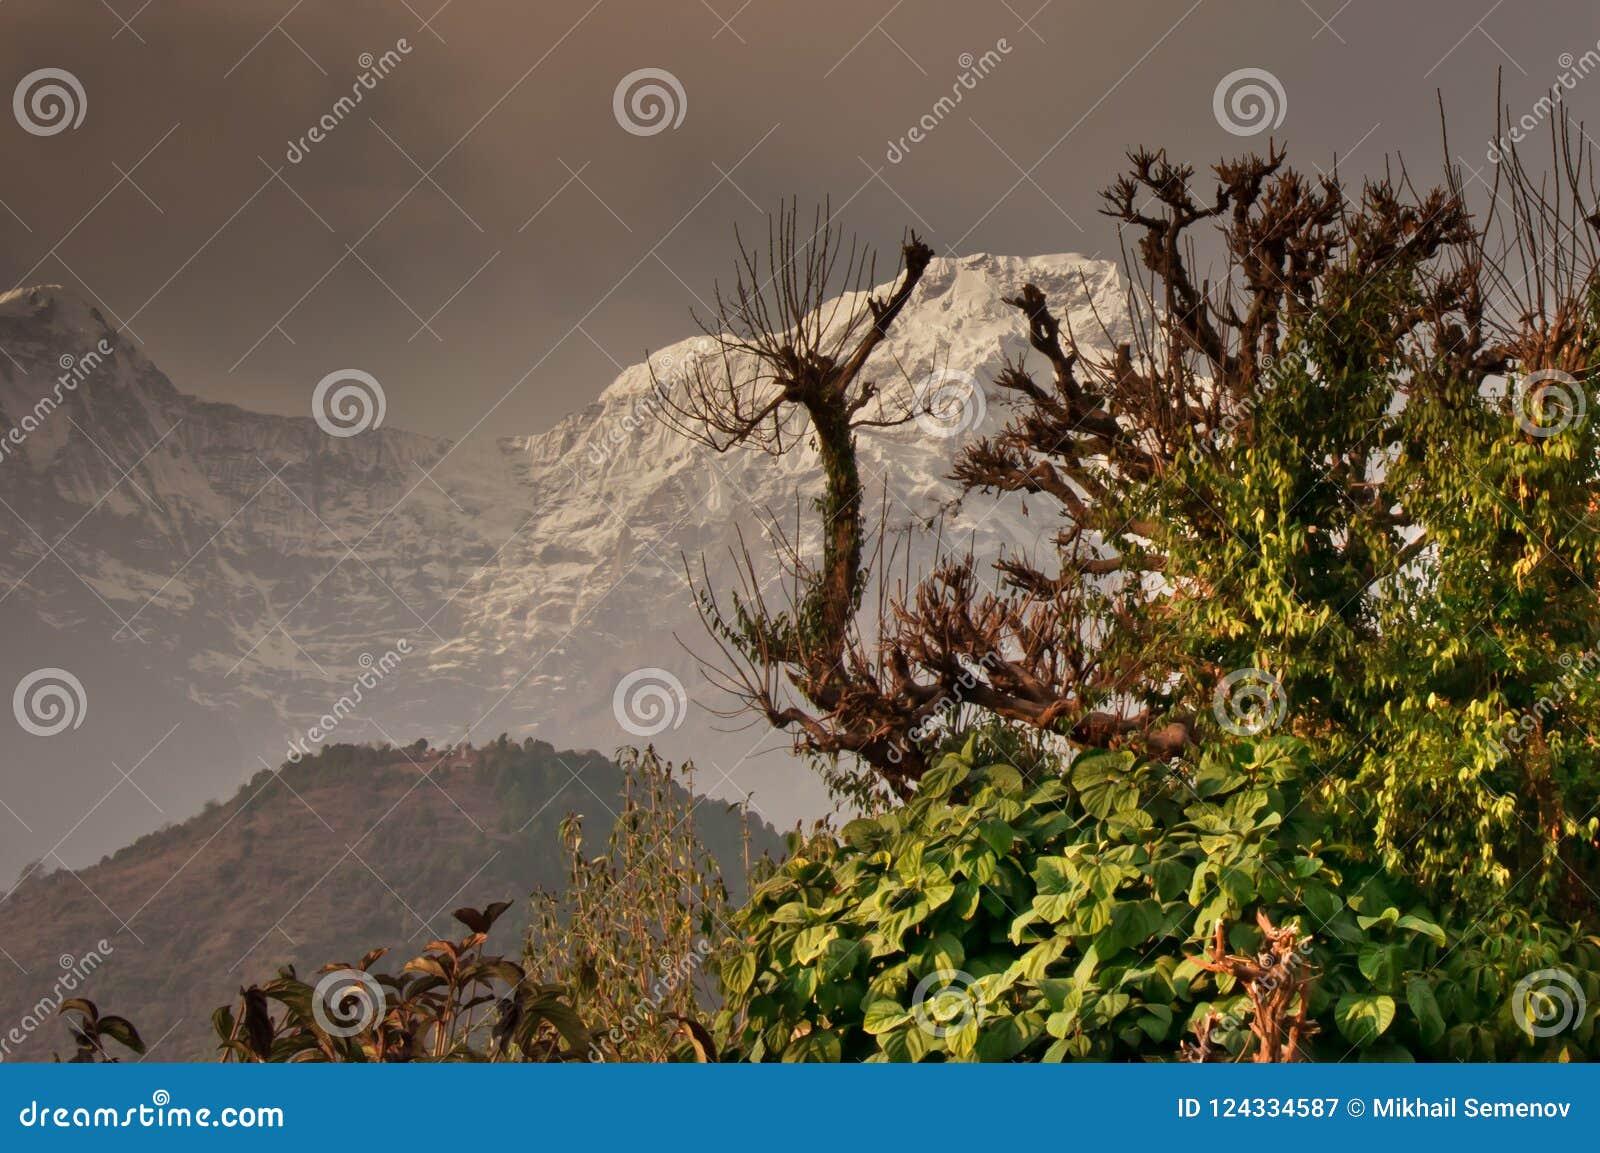 Tree and snowy mountain., trekking to the Annapurna